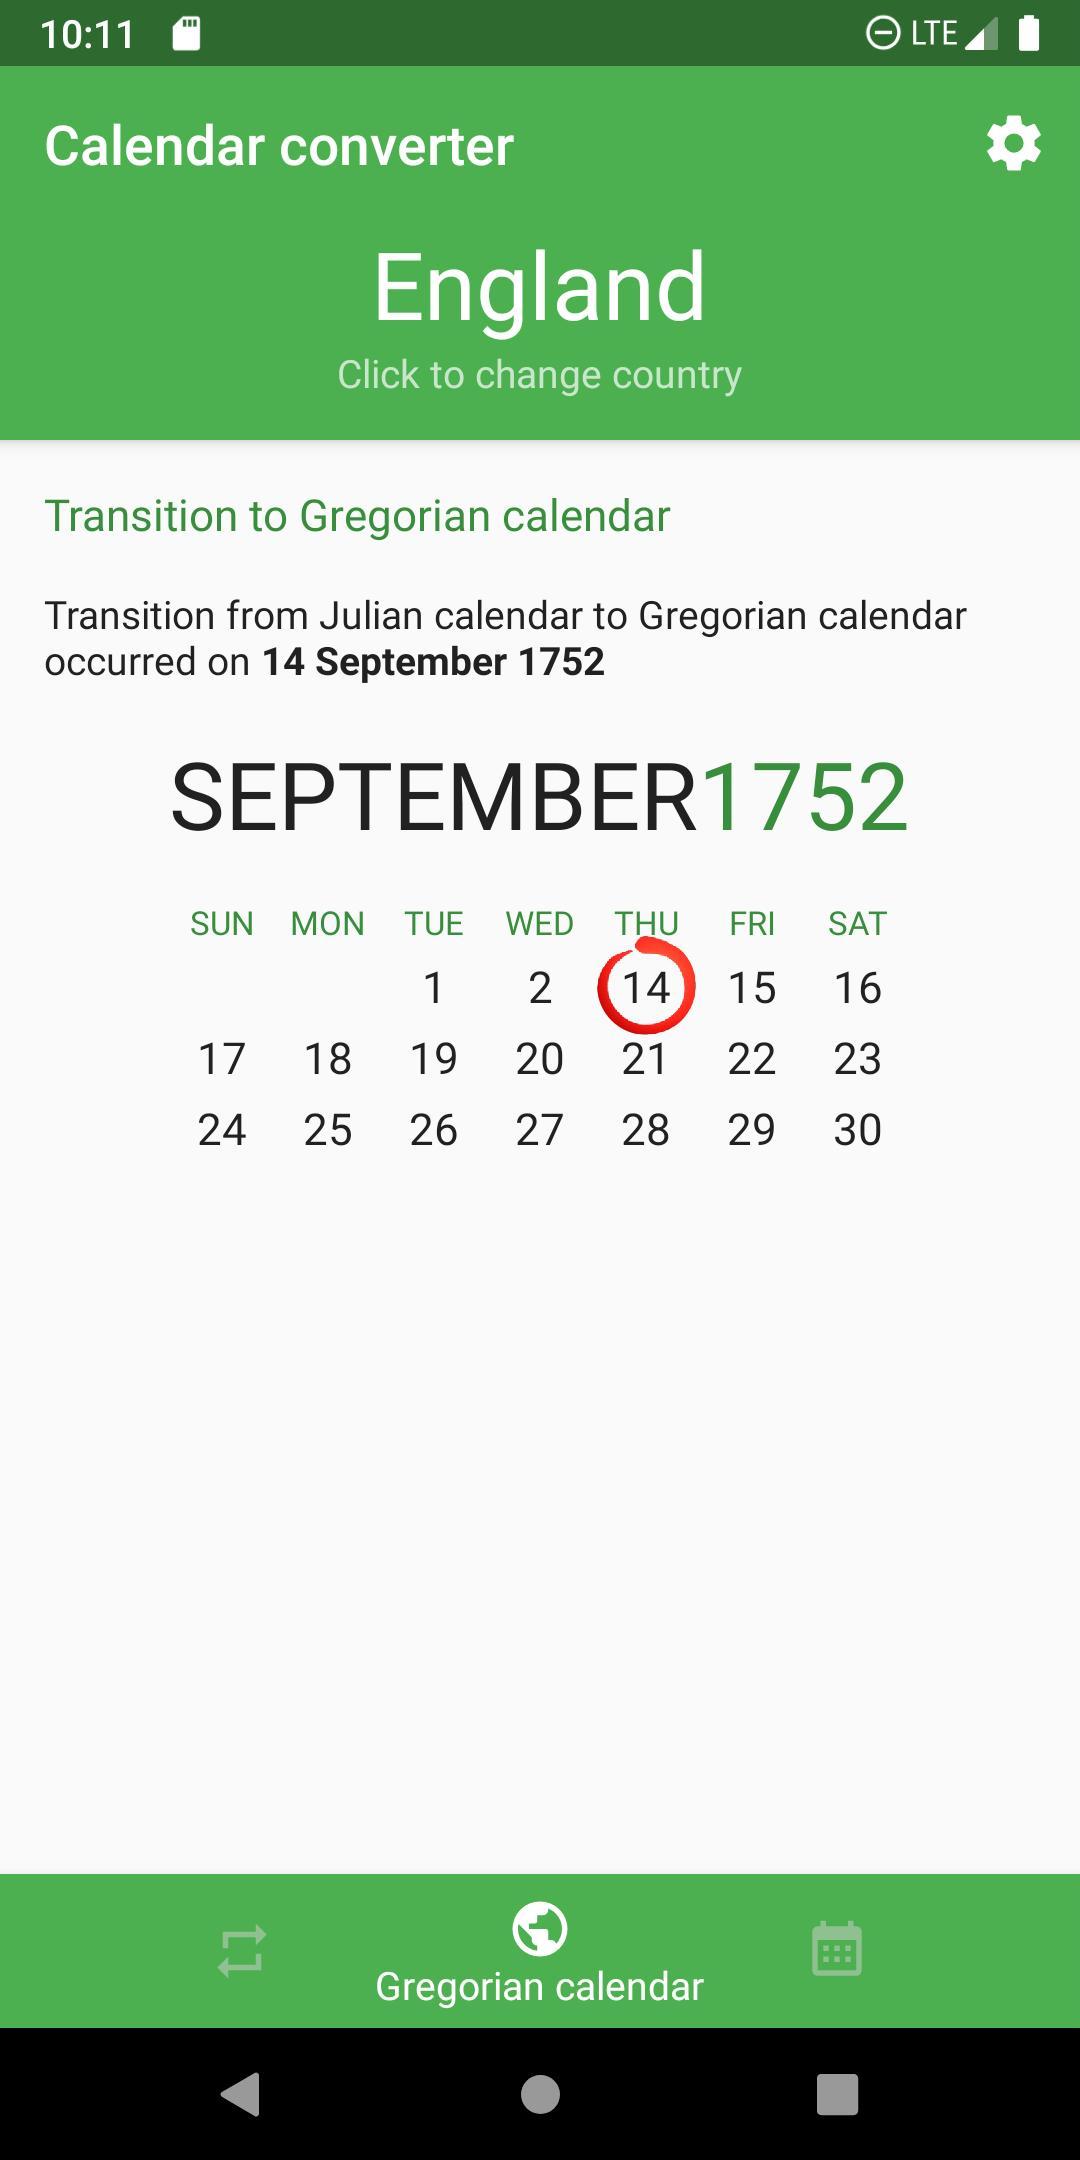 Calendar Converter For Android - Apk Download Intended For Convert Julian Date 2 025 To Calendar Date